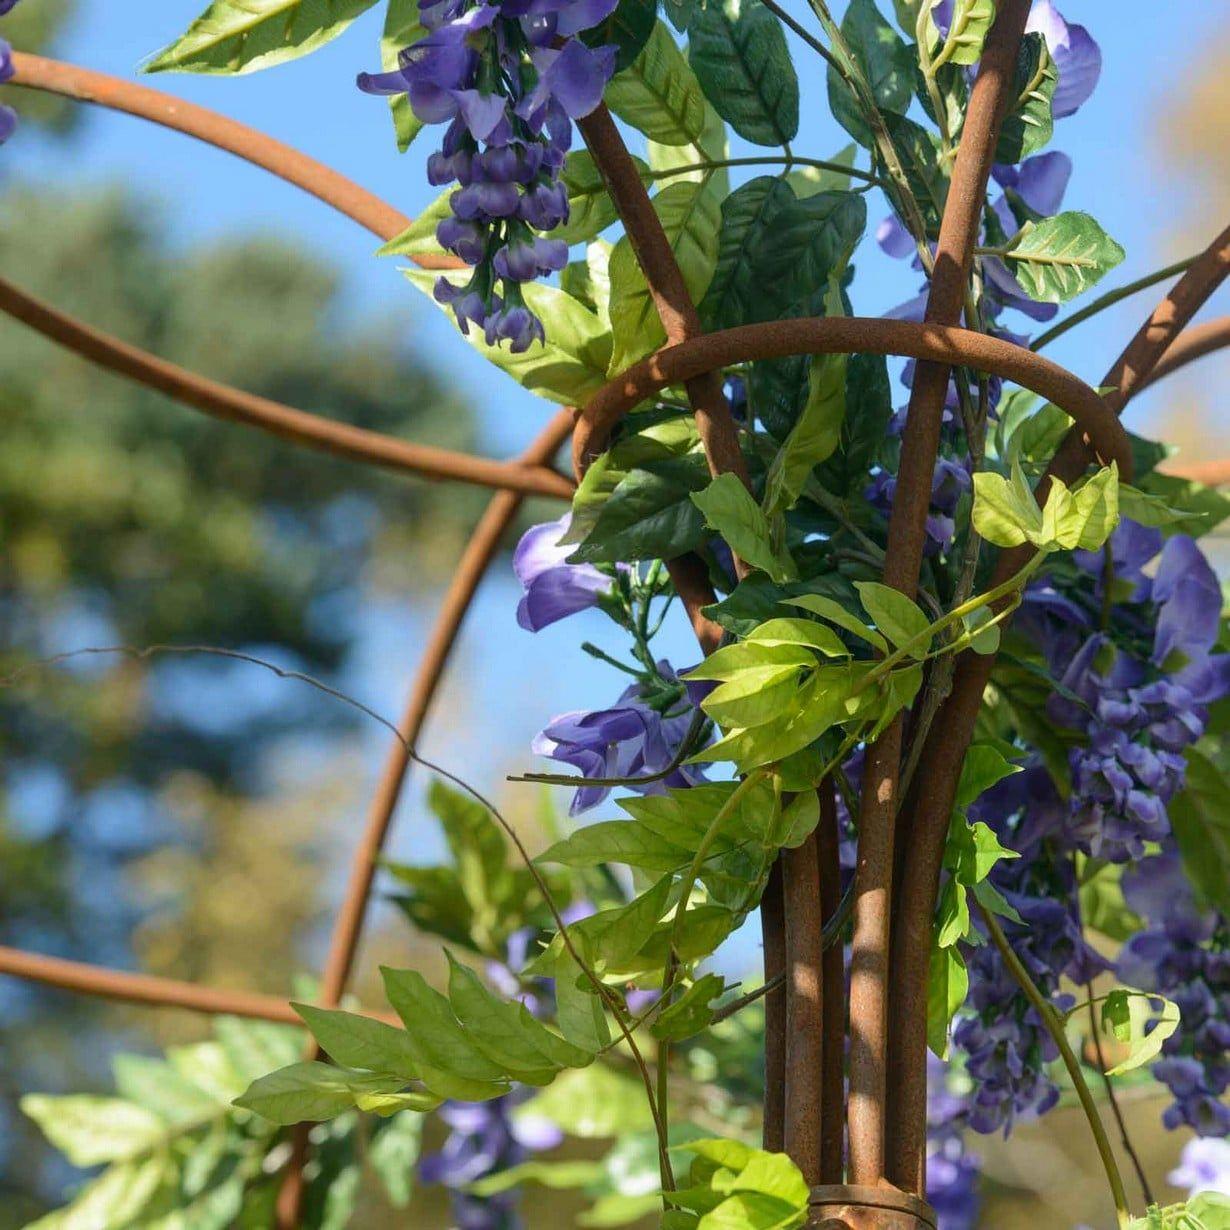 Harrod Wisteria Umbrella Support Frame Climbing Plant Support Plant Supports Wisteria